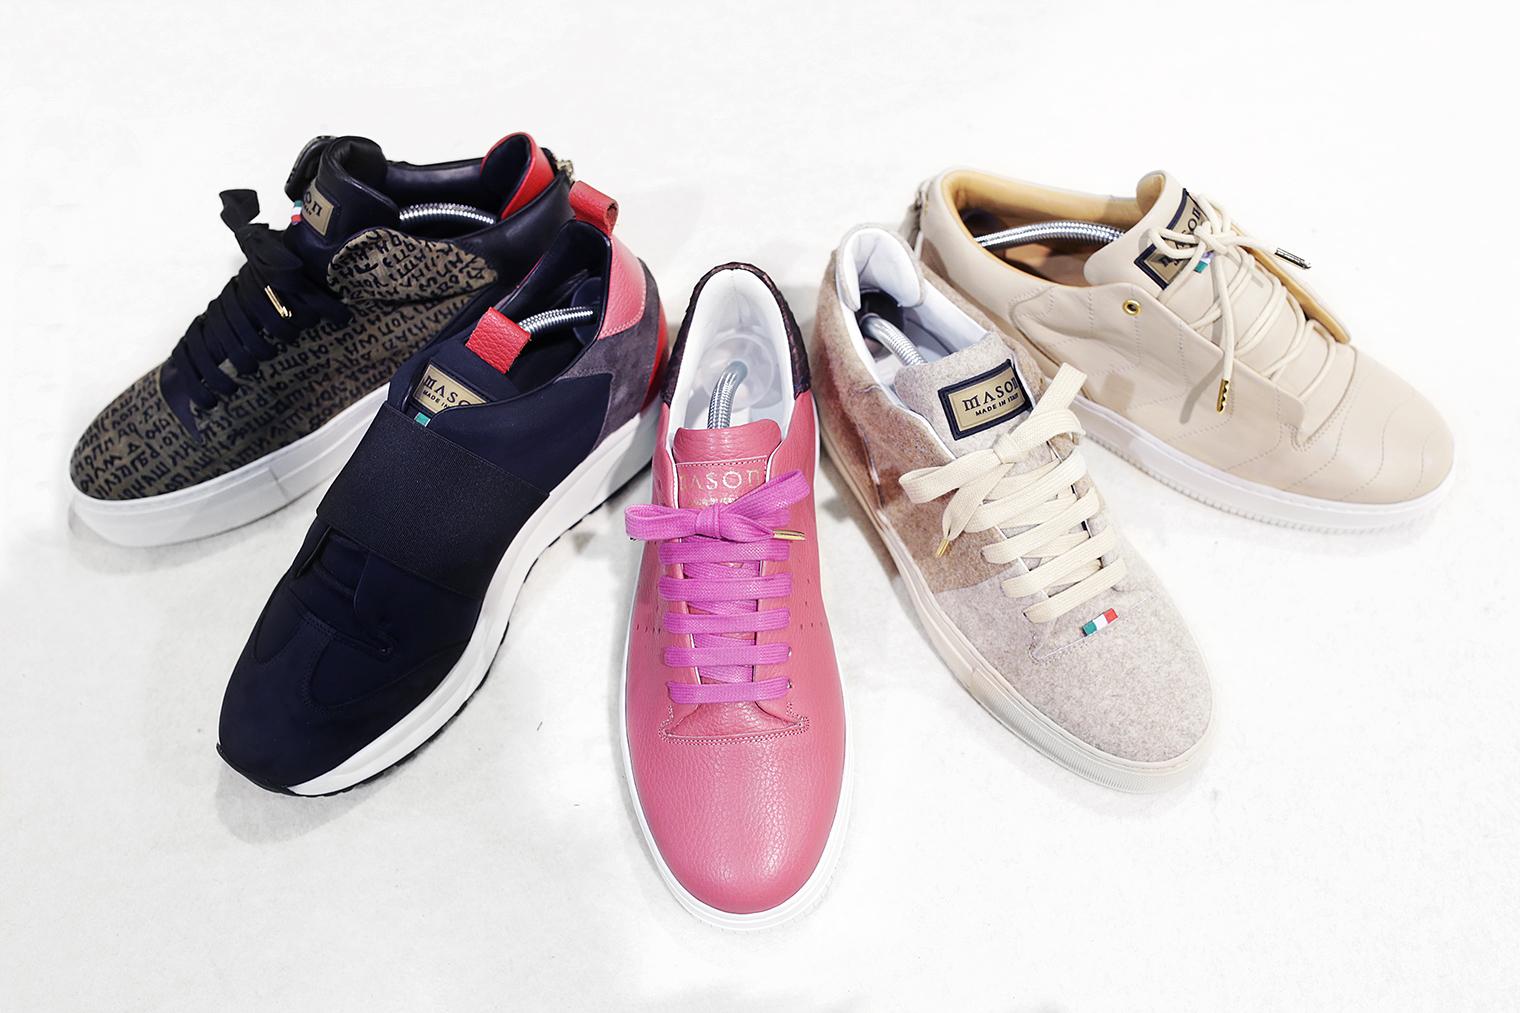 Mason Garments Summer Collection